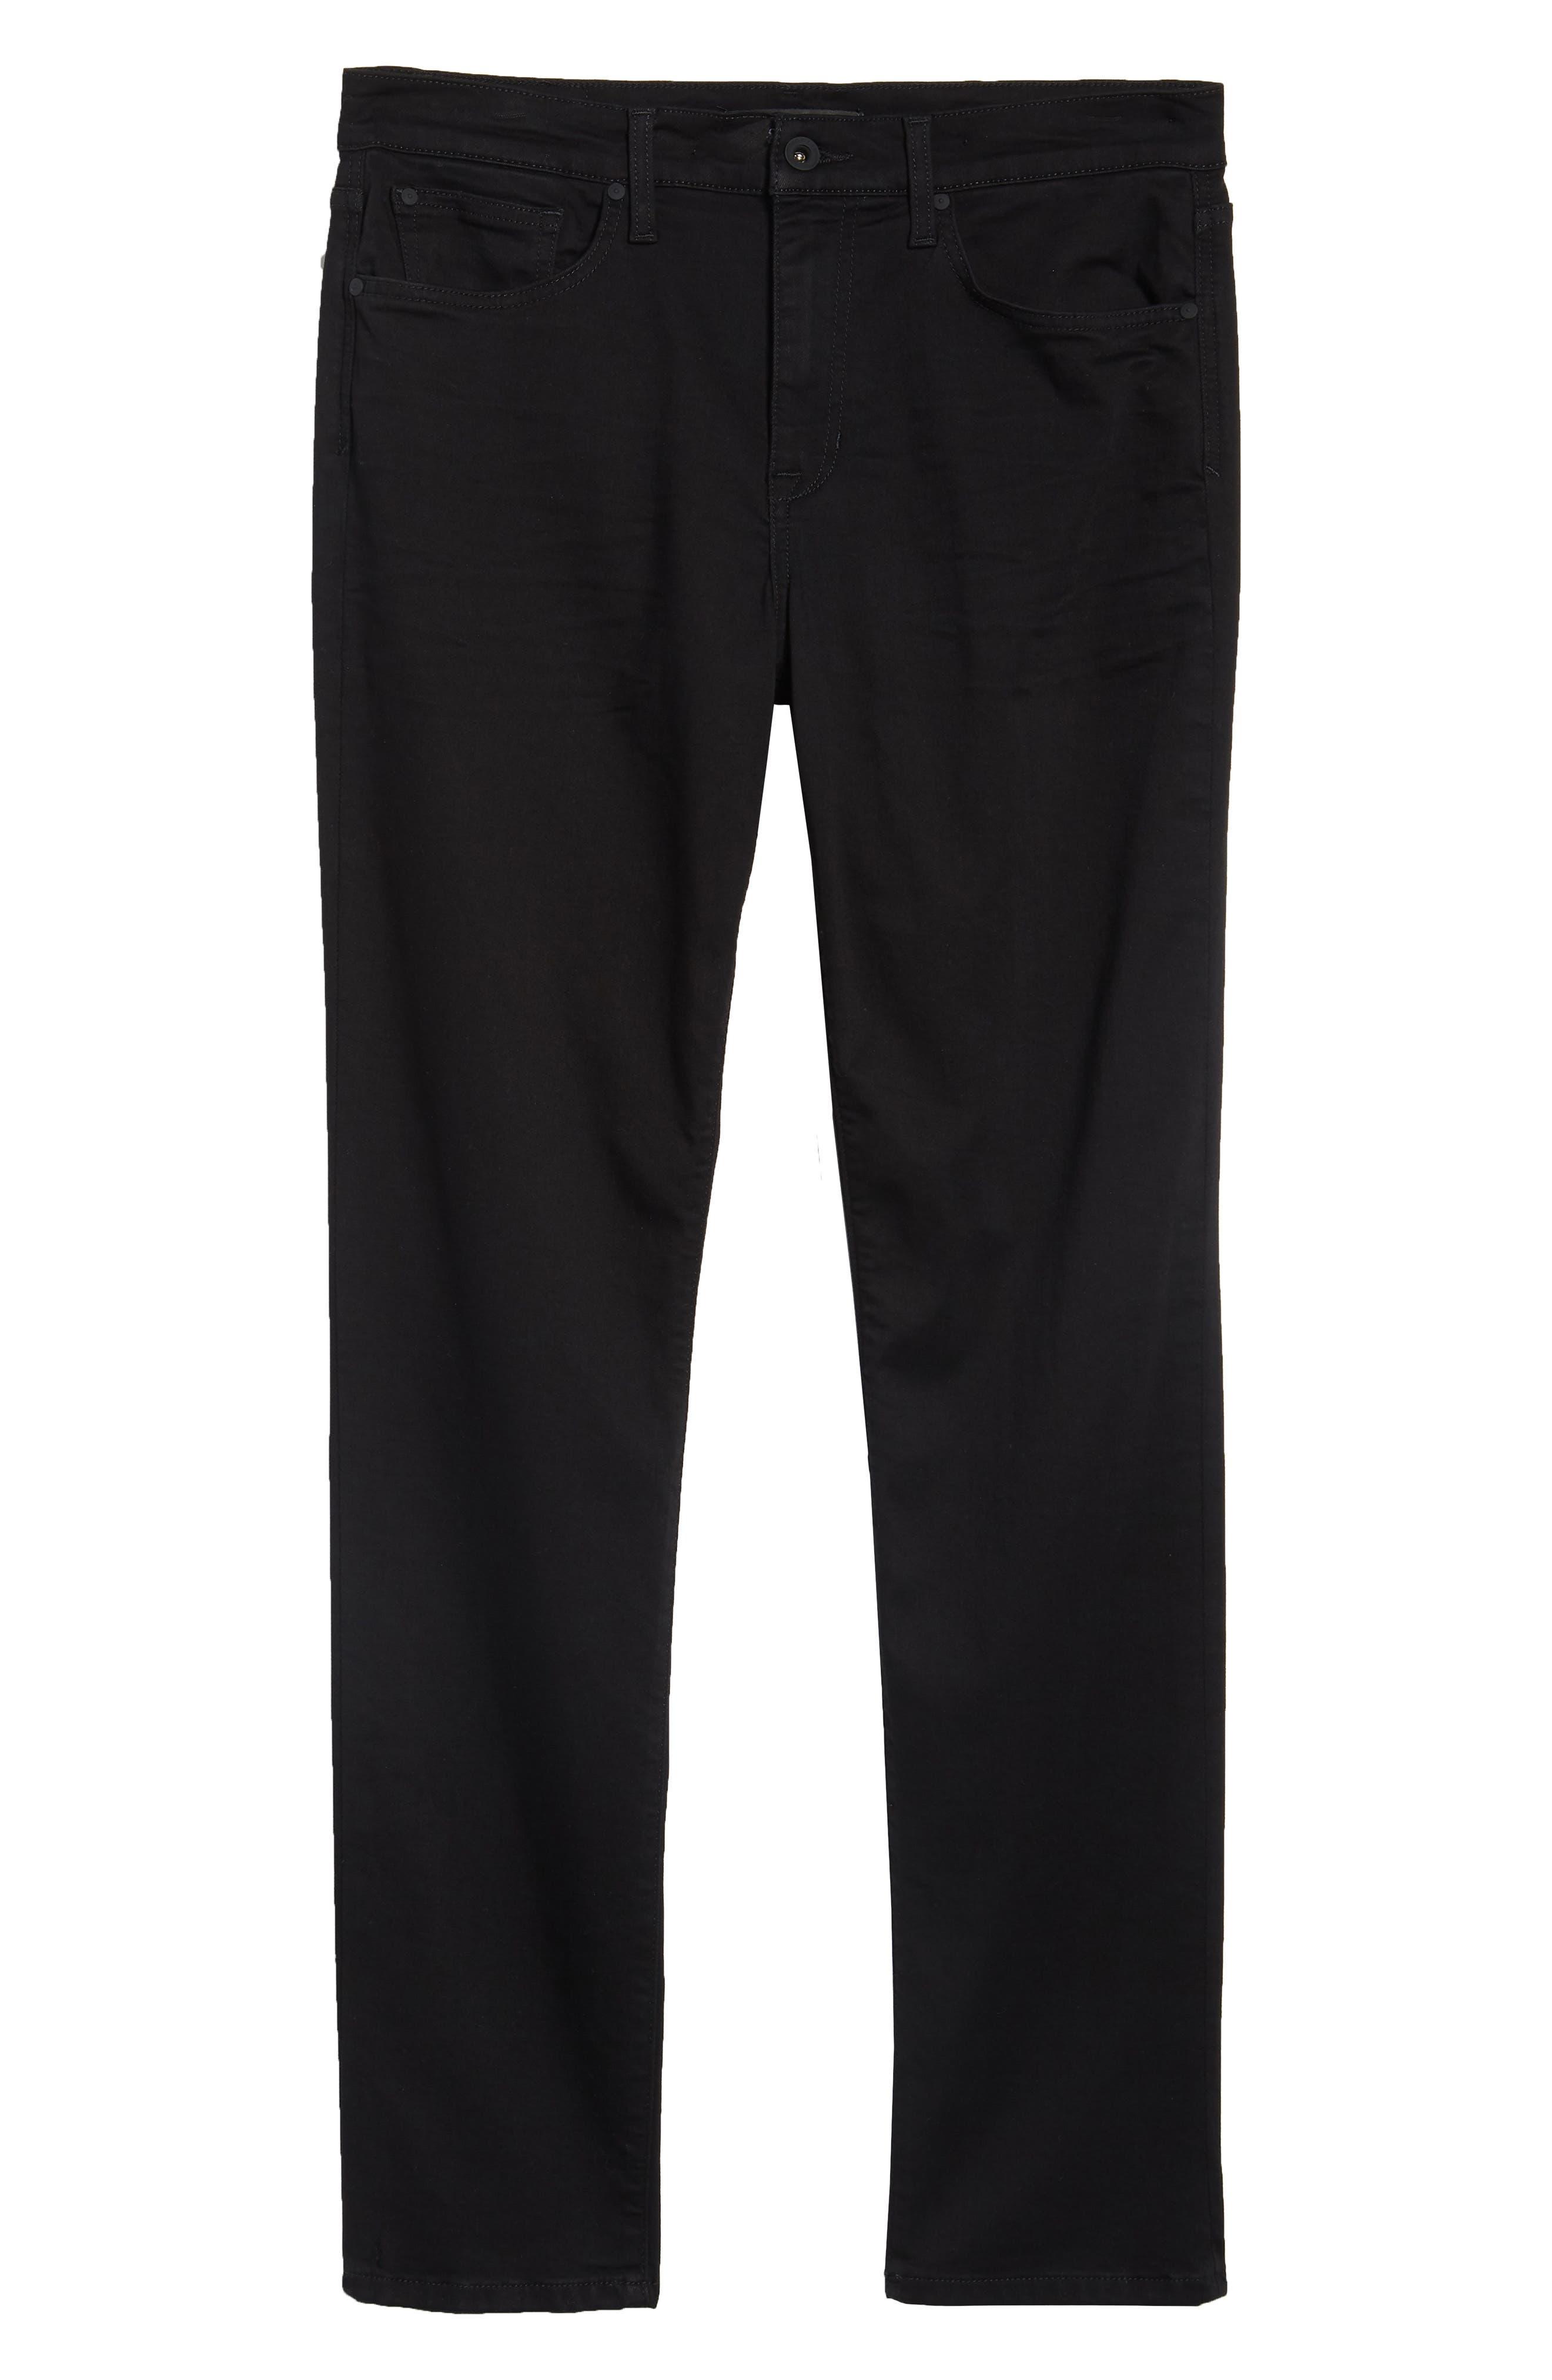 Folsom Athletic Slim Fit Jeans,                             Alternate thumbnail 6, color,                             Edleman